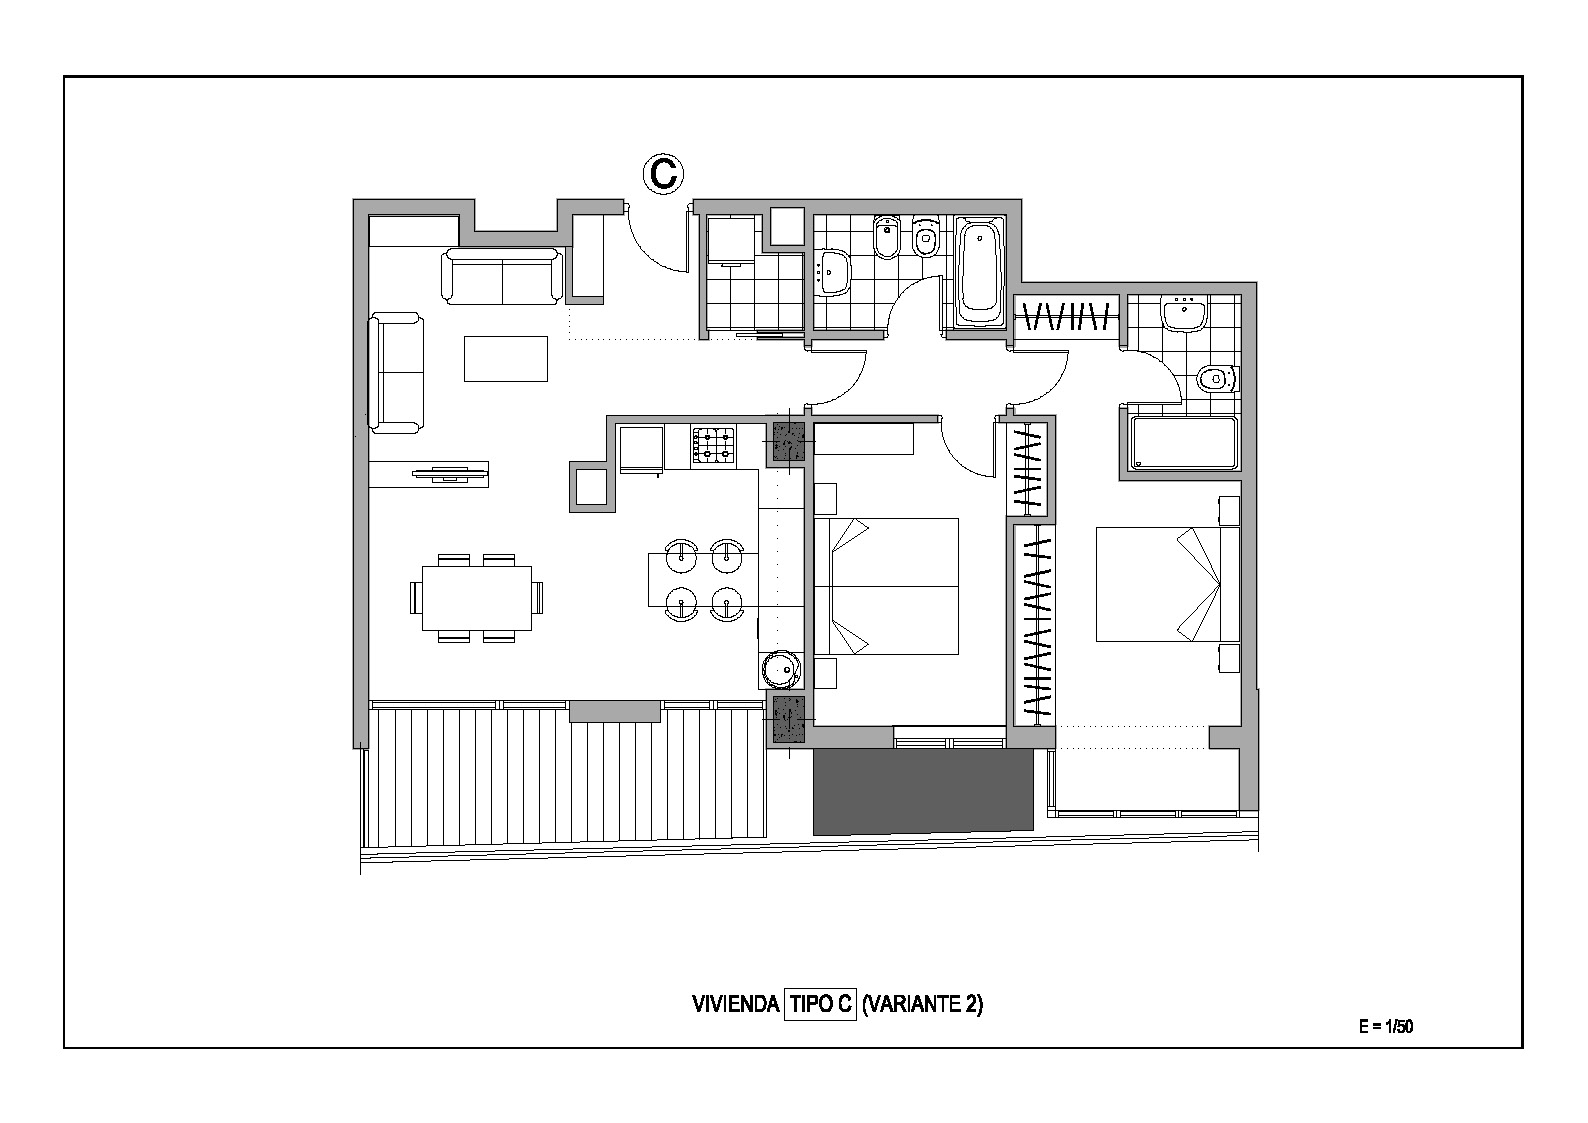 Estudio distribuci n sal n cocina 2 dormitorios adecursos - Distribucion salon comedor rectangular ...